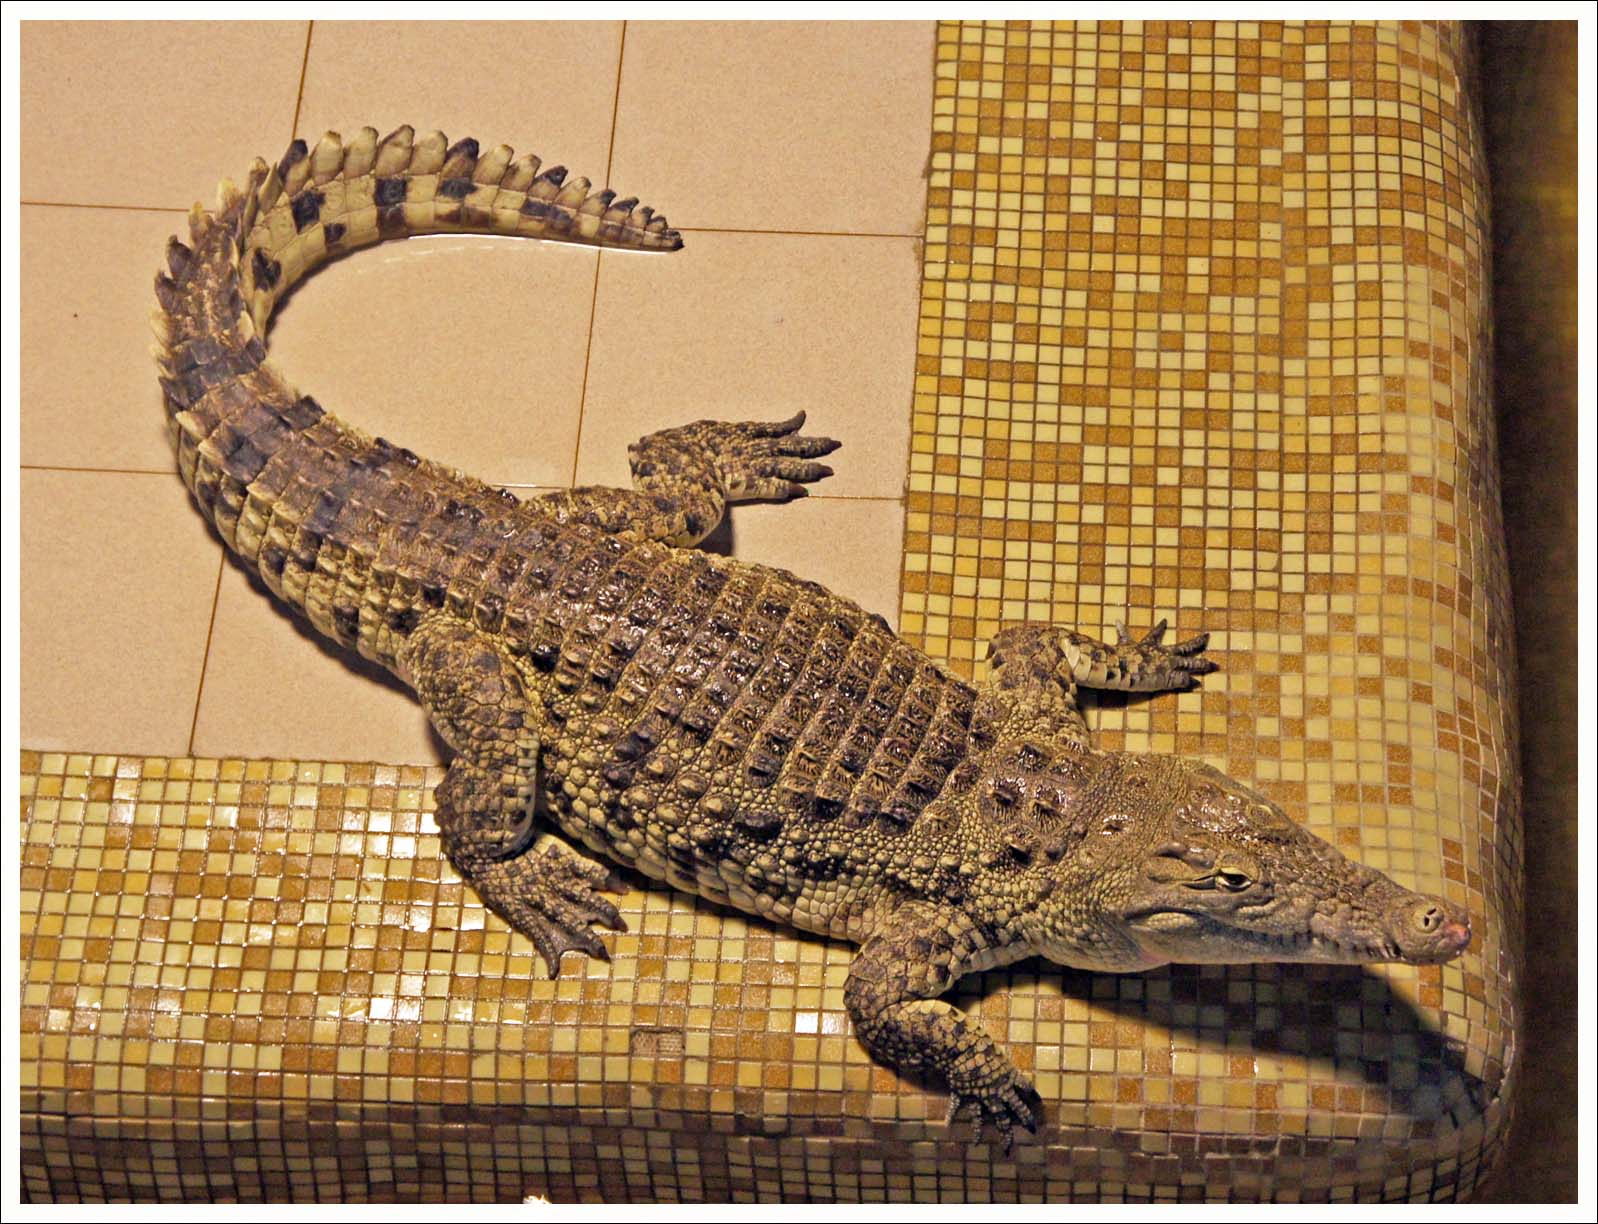 крокодил статист